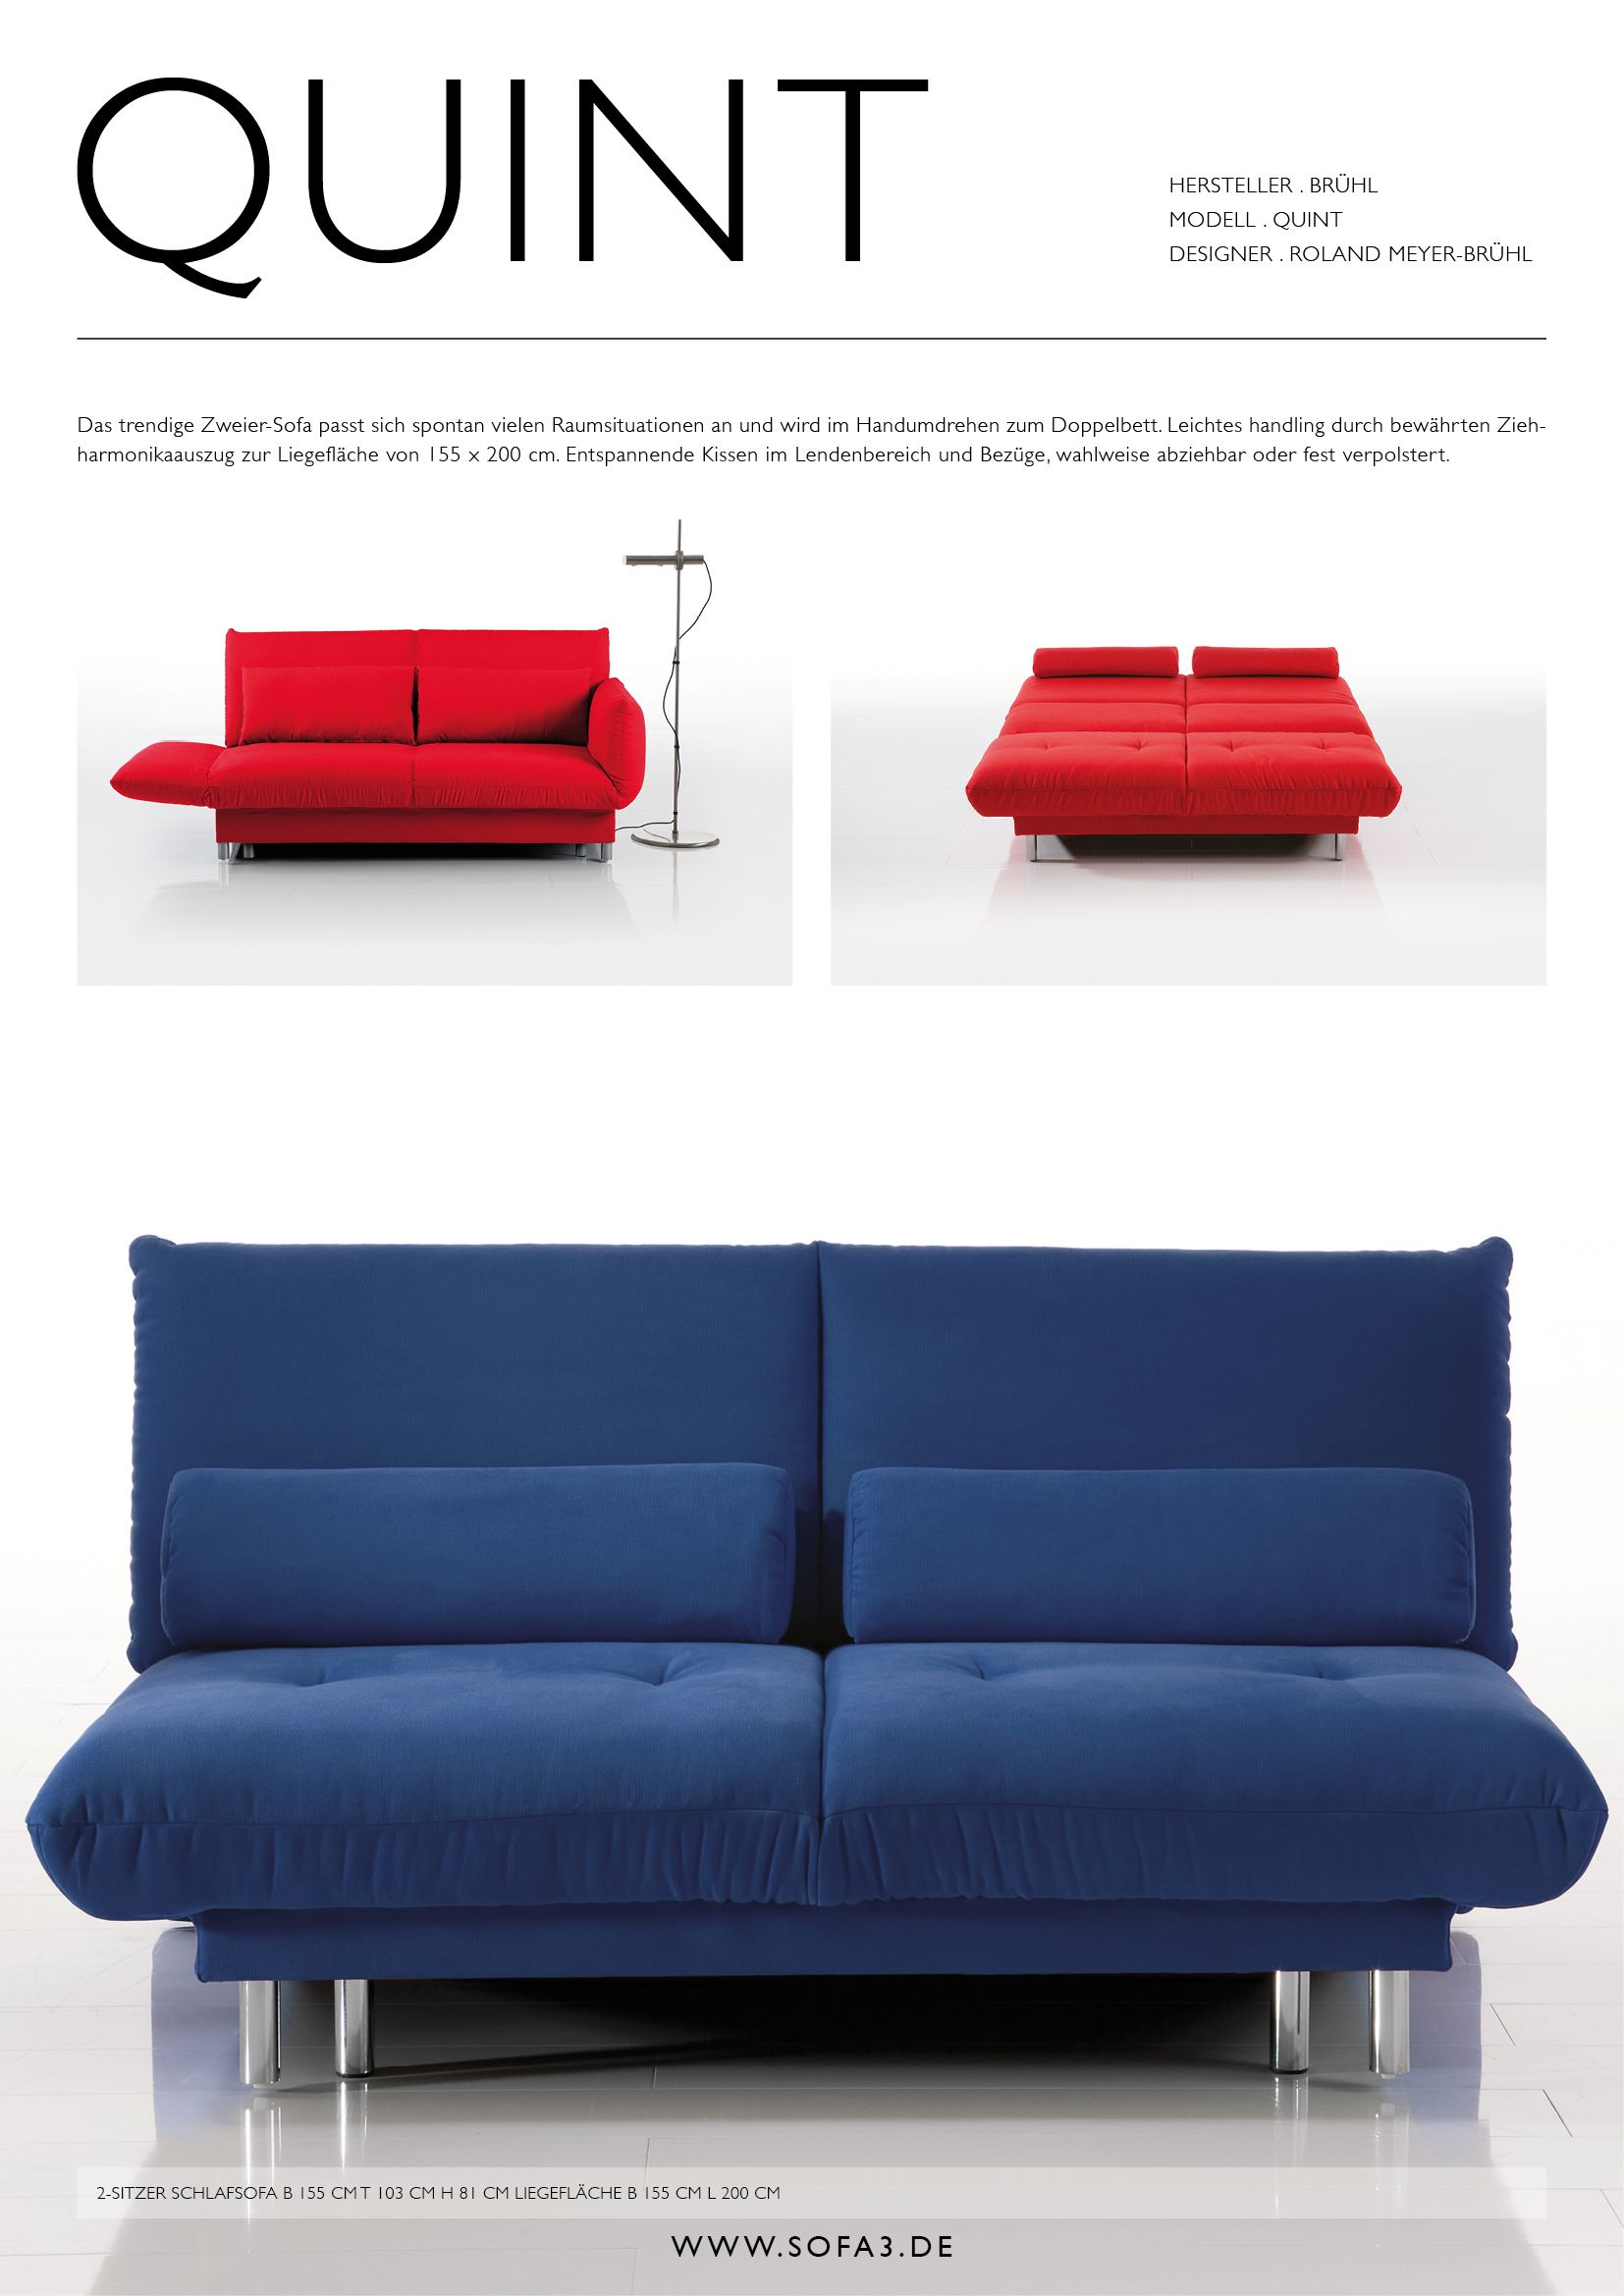 Einrichtungshaus Heidelberg quint brühl bruehl roland meyer brühl sofas sofa sofa3